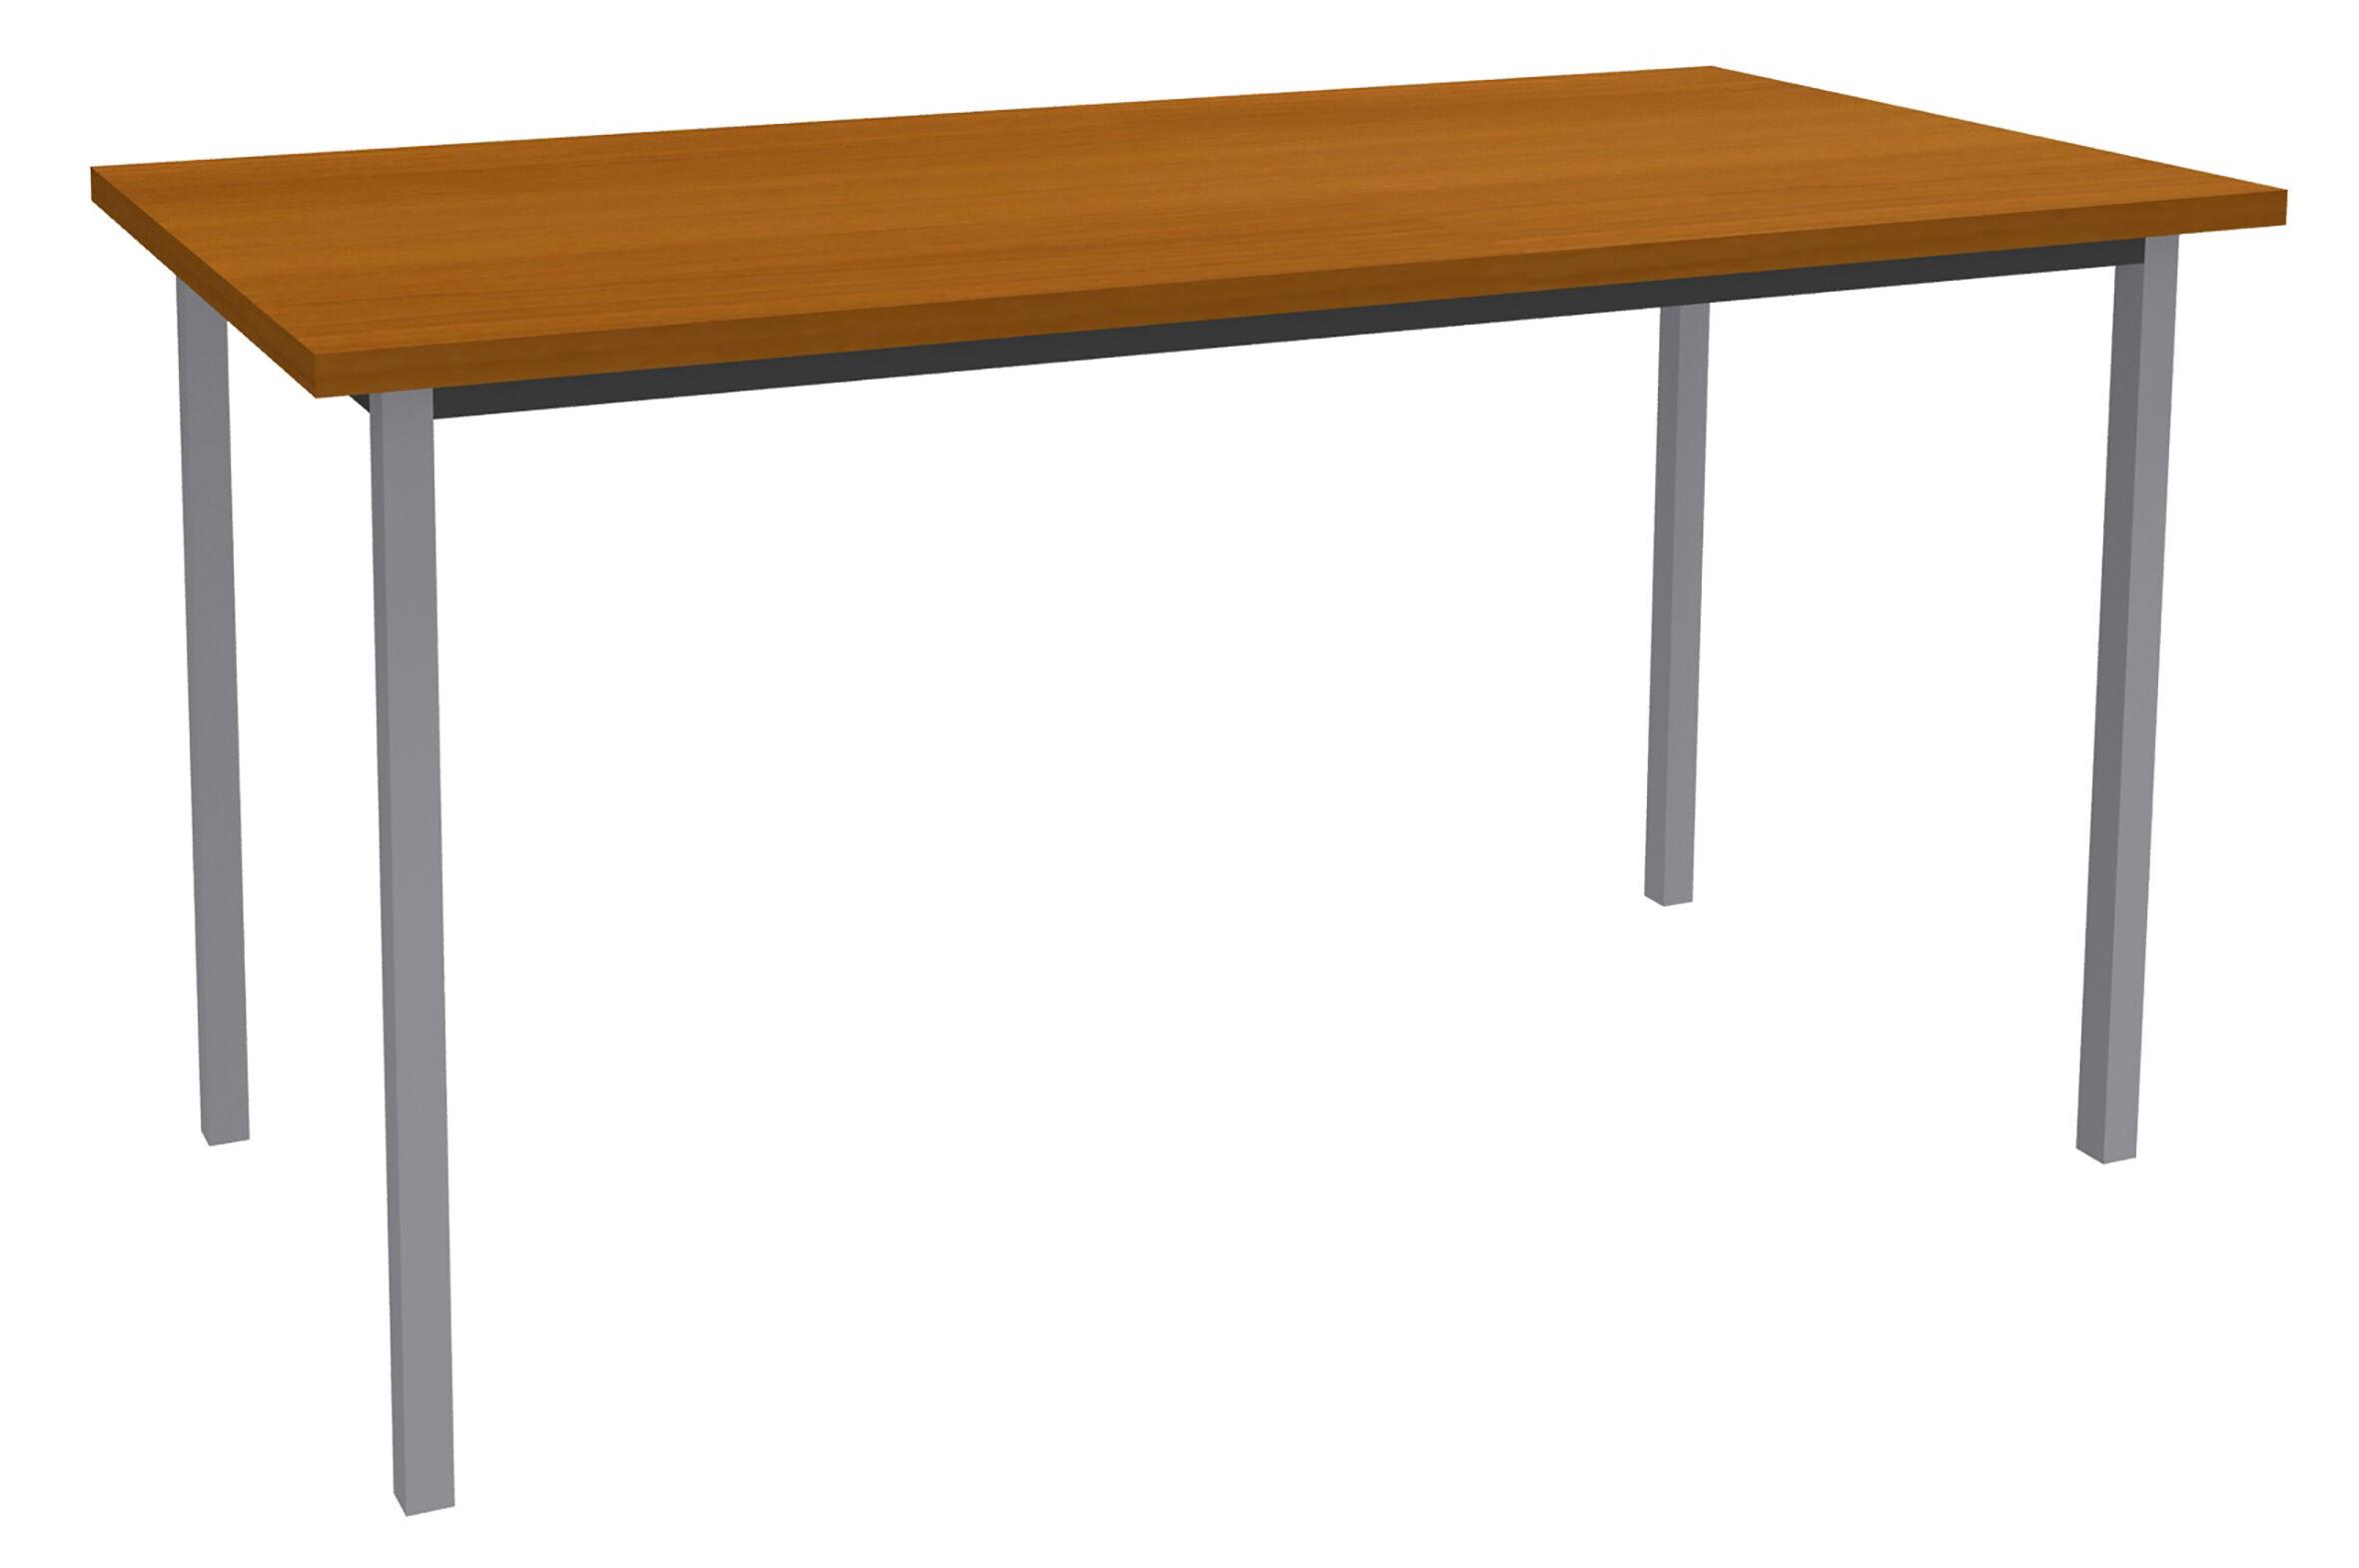 Table de réunion Rectangulaire - 120 x 60 cm - Pieds aluminium - imitation merisier